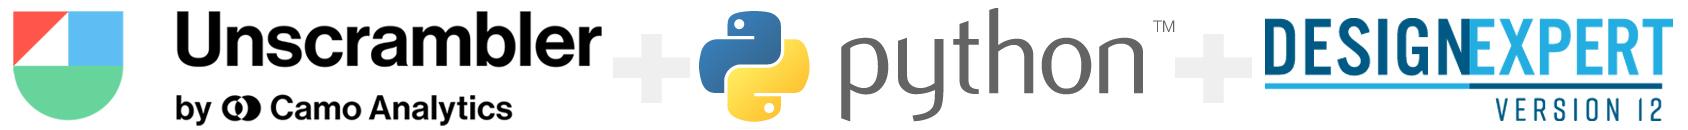 Unscrmabler 11 - Python - Design Expert